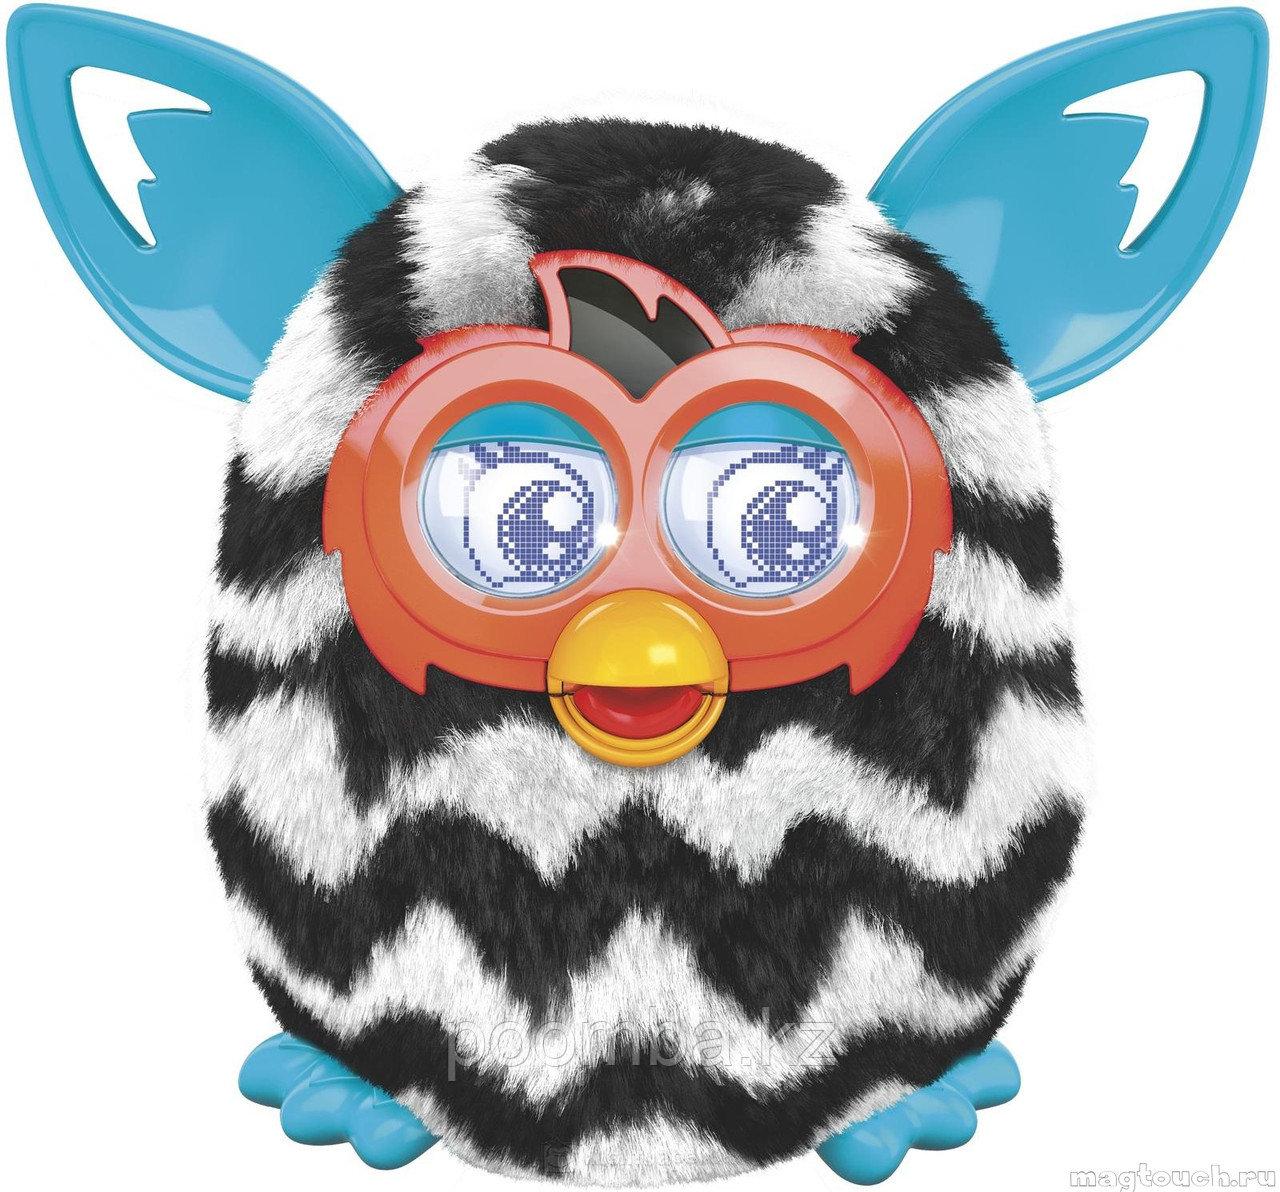 Furby Boom - Ферби Бум Zig Zag Stripes Зигзаг - говорит по русски, интерактивная игрушка от Hasbro.